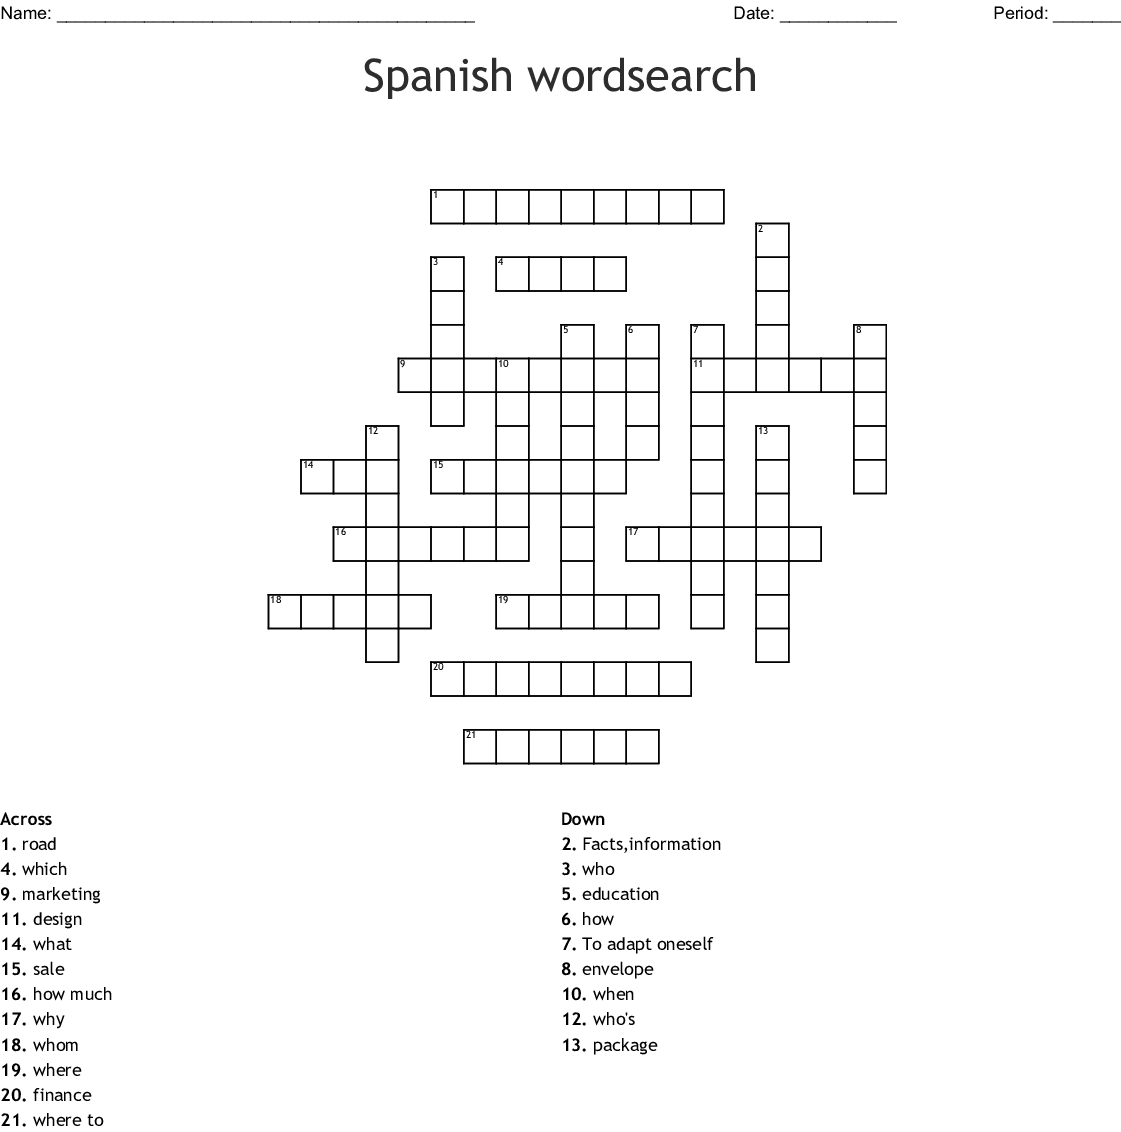 Spanish Wordsearch Crossword